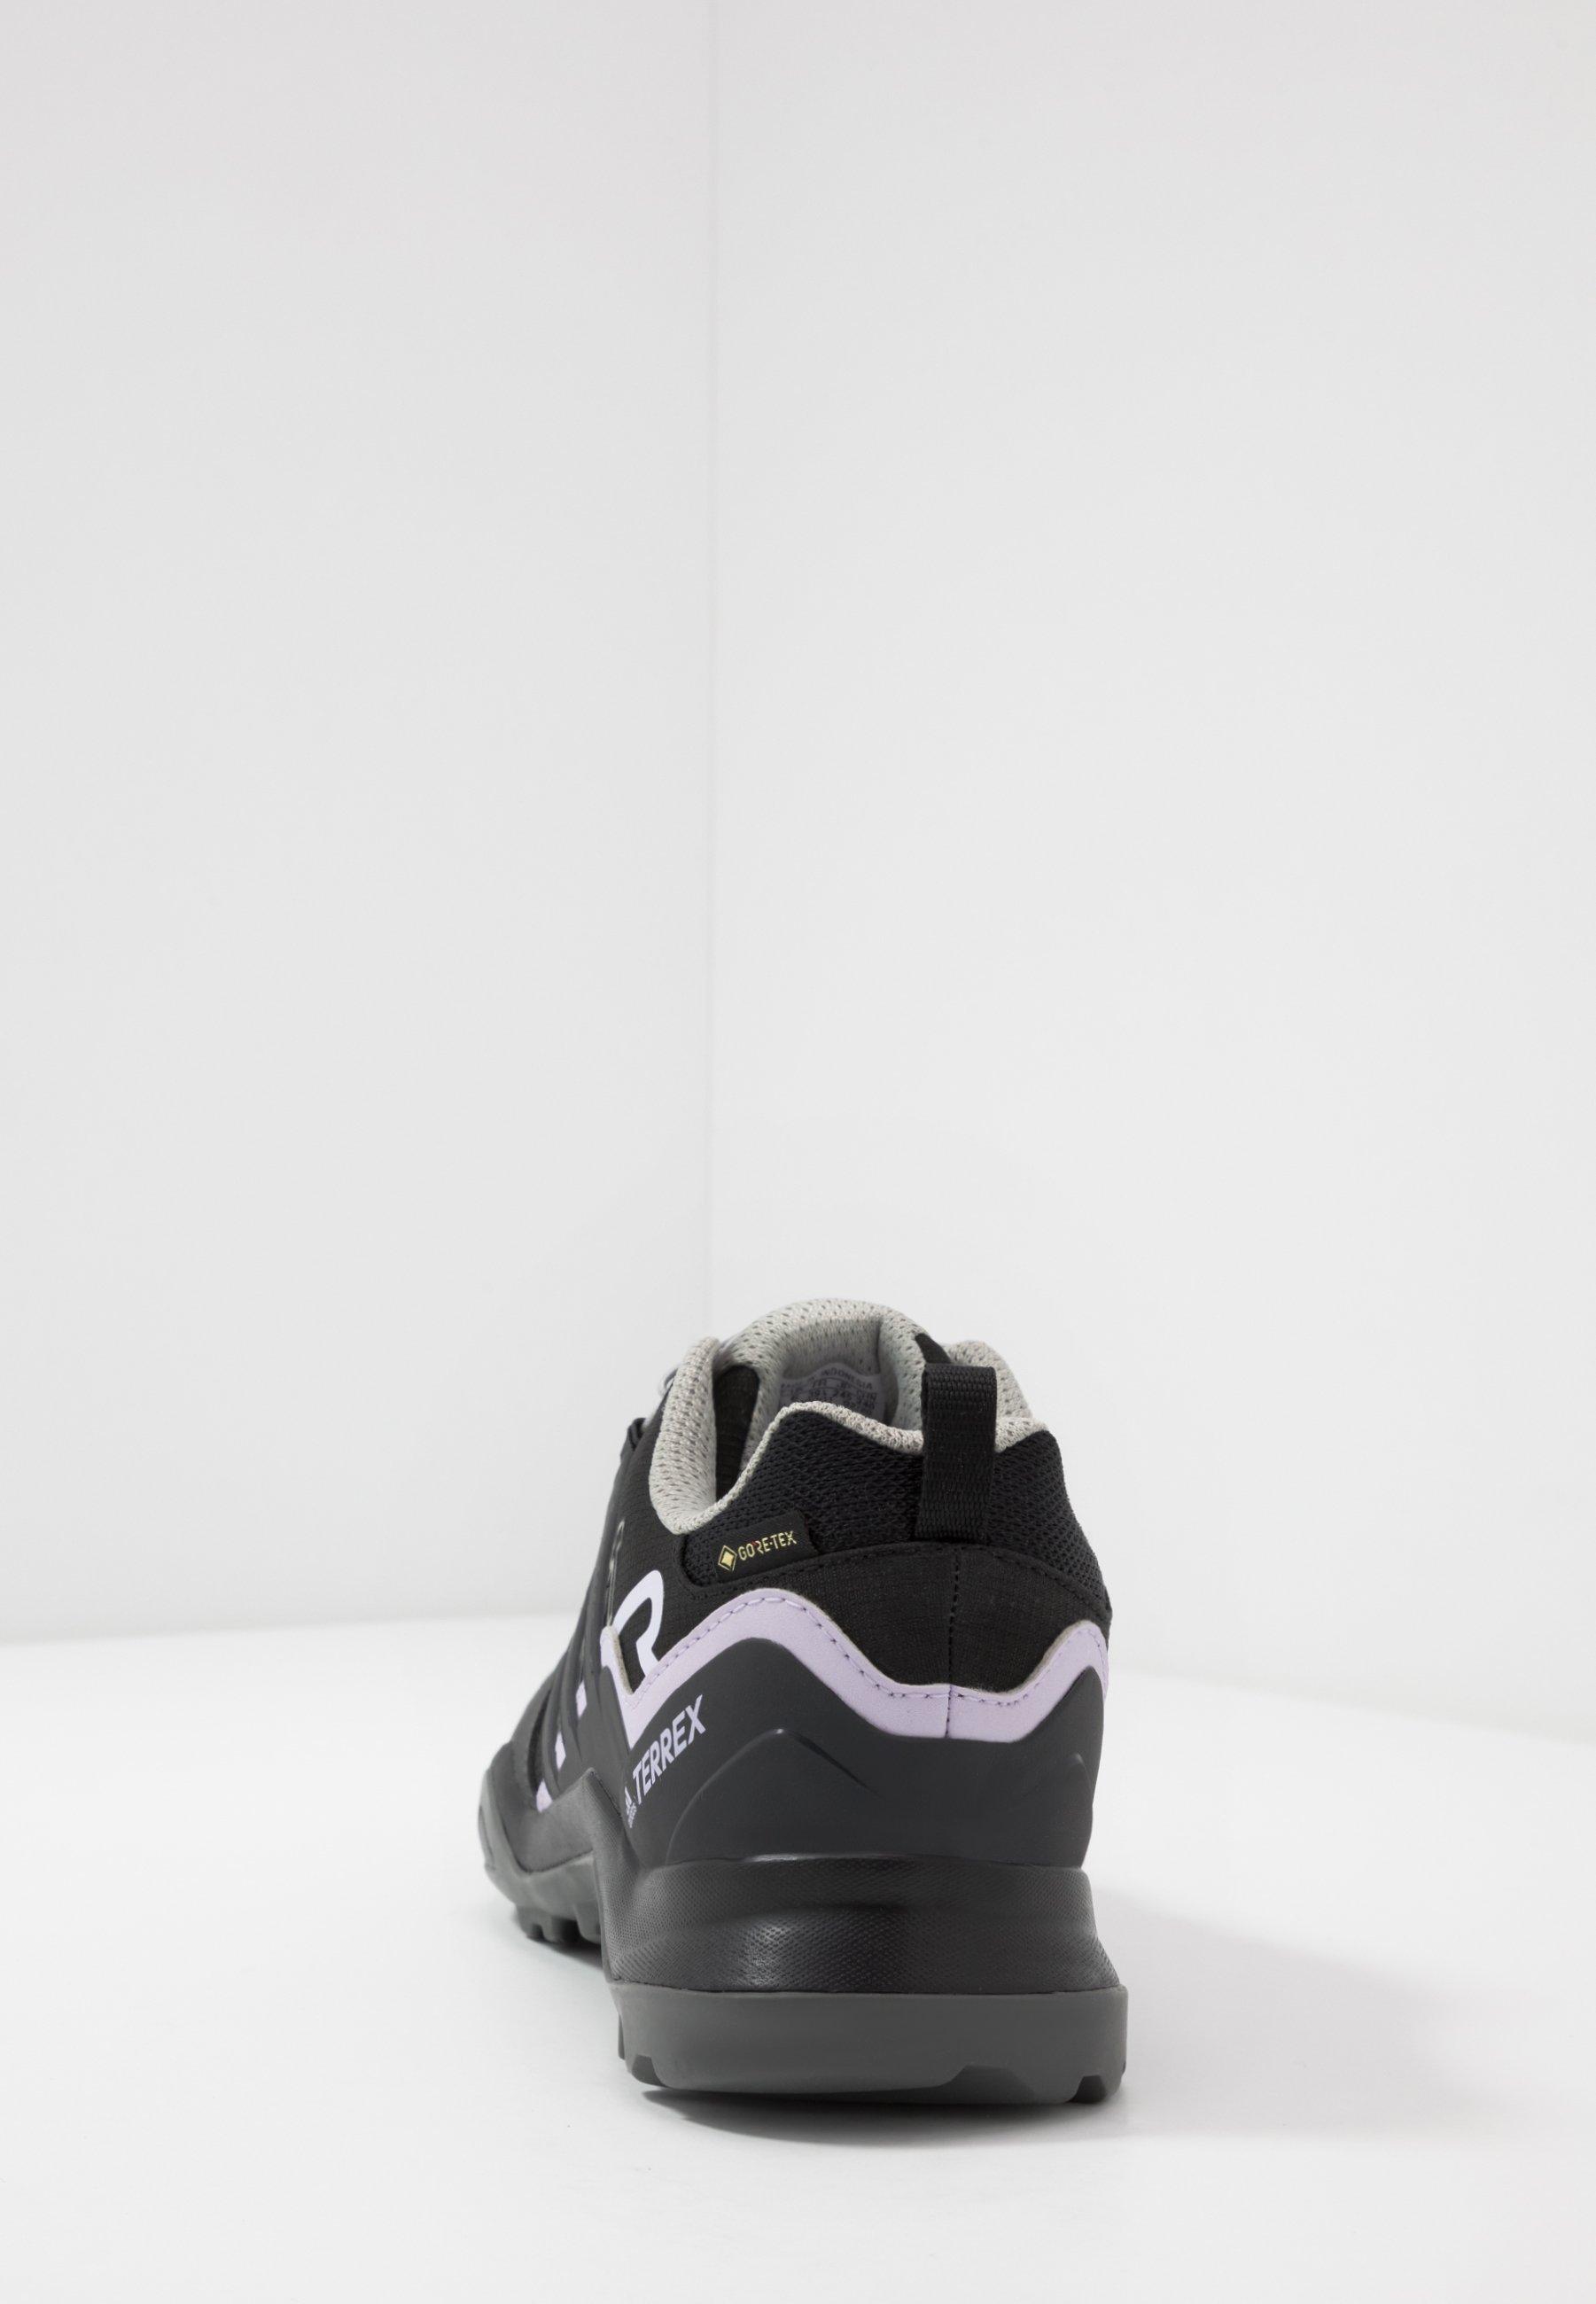 Adidas Performance Terrex Swift R2 Gtx - Outdoorschoenen Core Black/solid Grey/purple Tint Goedkope Schoenen